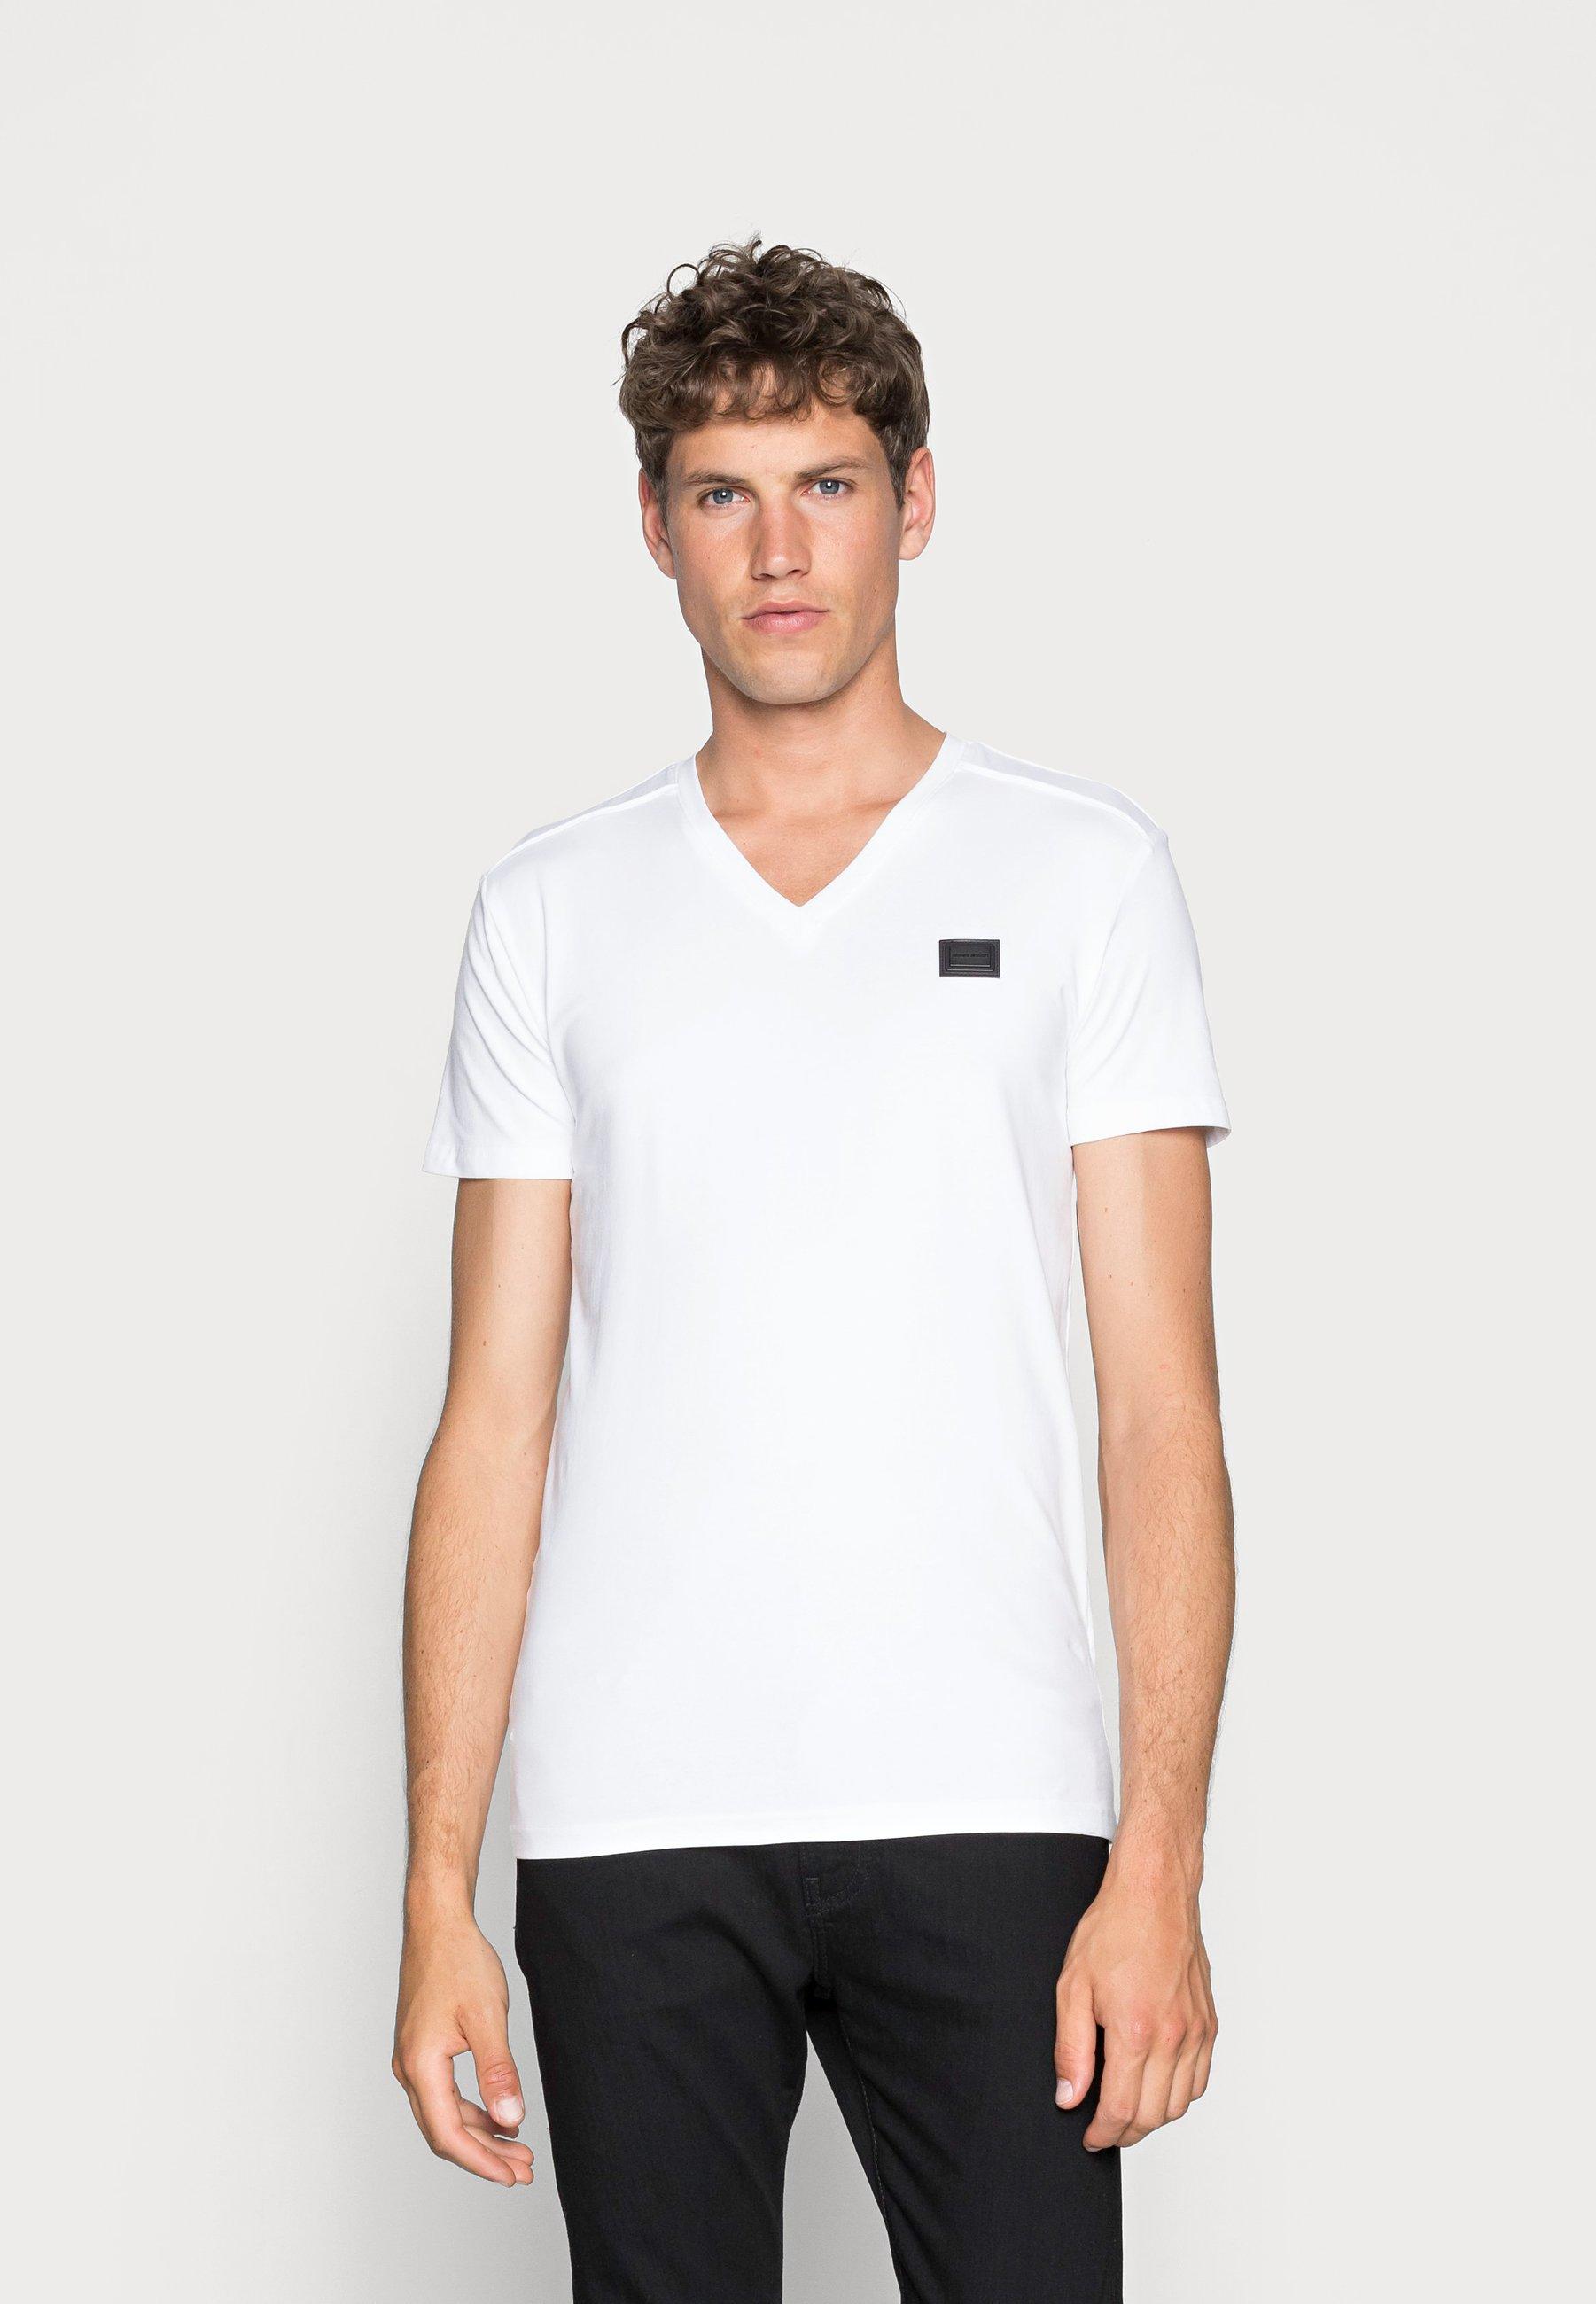 Men SPORT V-NECK WITH METAL PLAQUETTE - Basic T-shirt